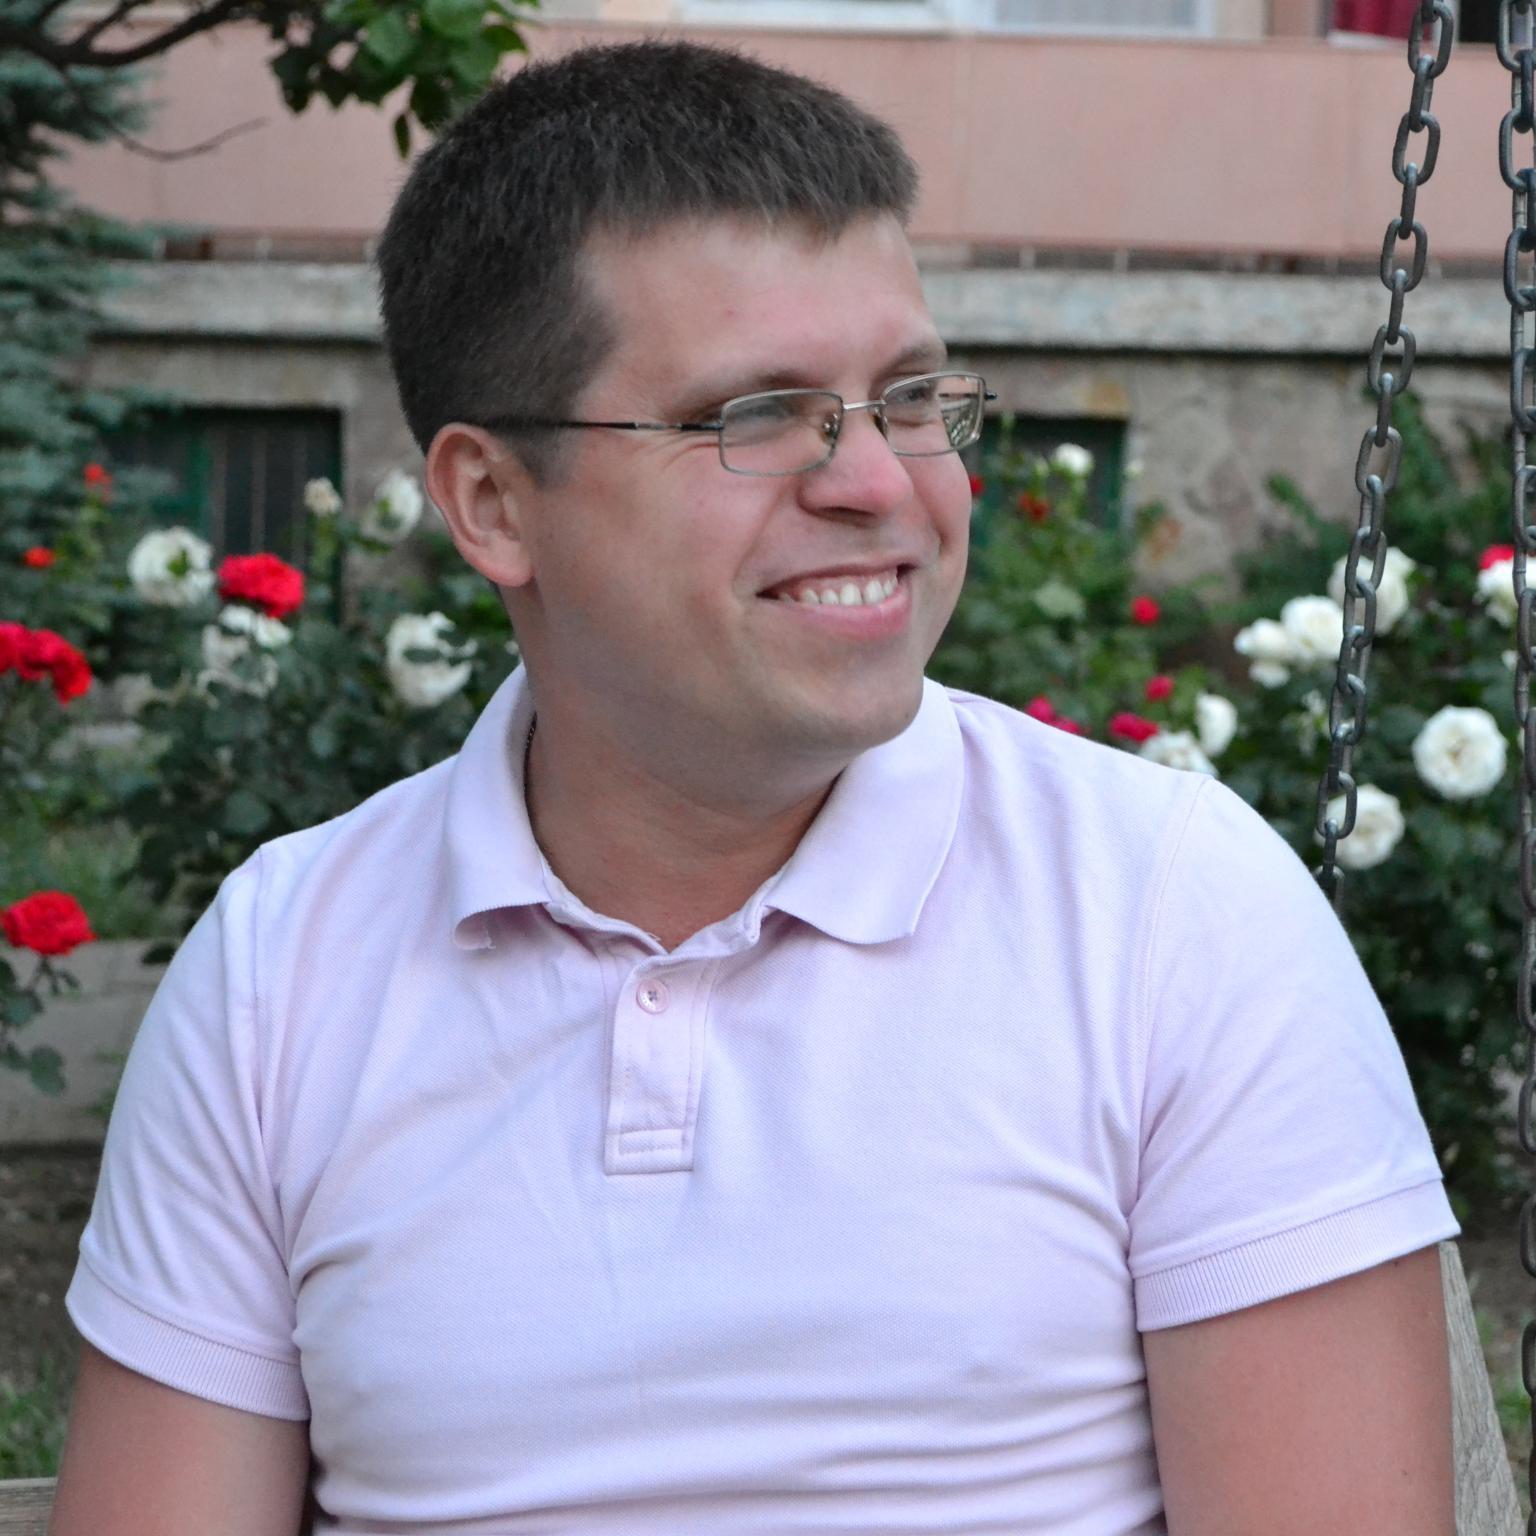 Аватар пользователя Андрій Ланчковський Ланчковский